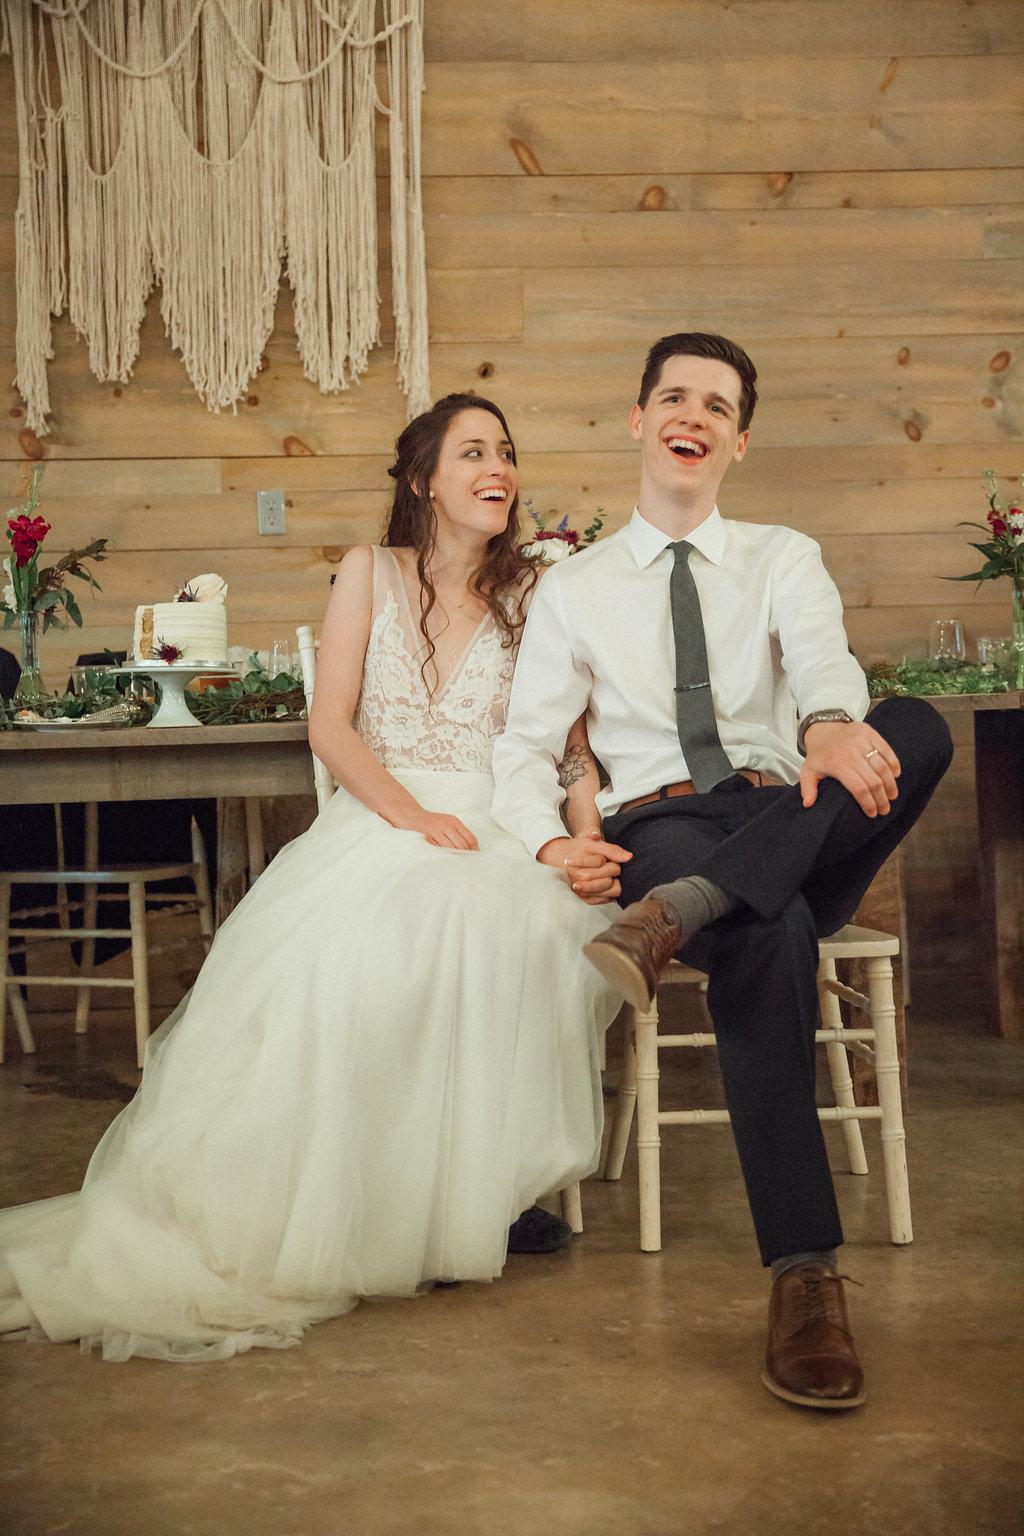 Honeysuckle-Hill-Weddings-Mallory-Patrick-114.jpg